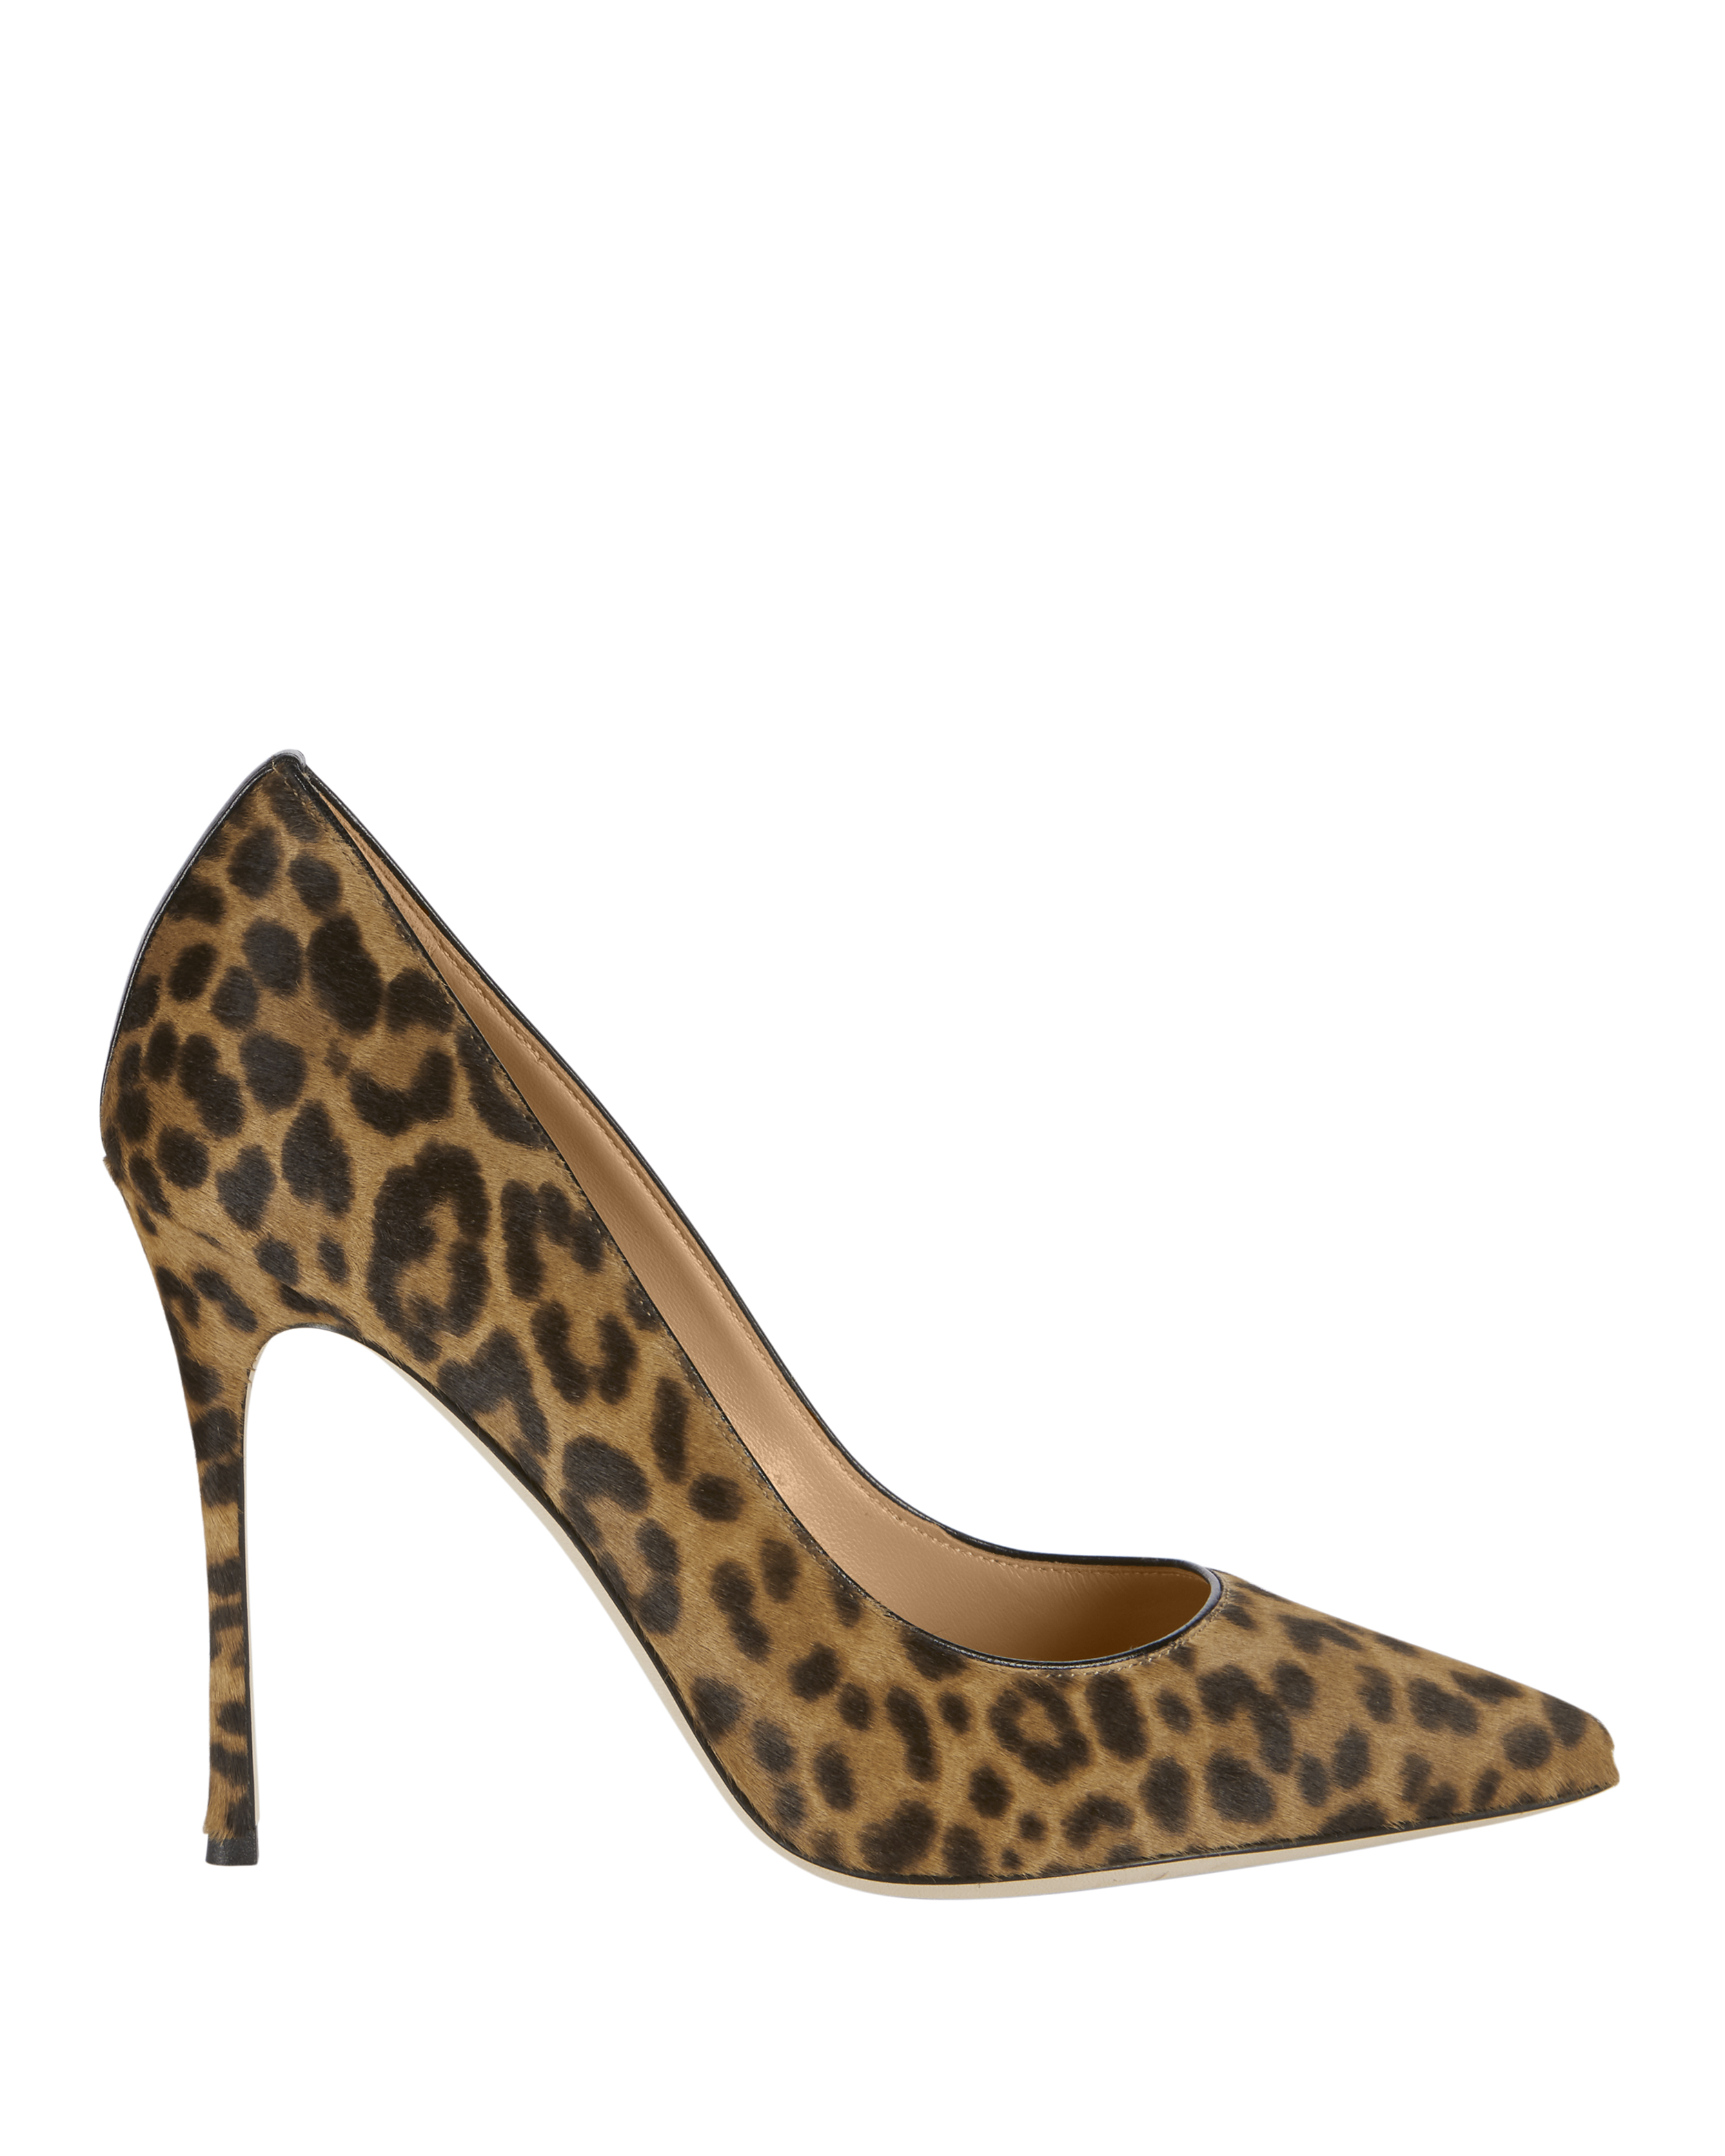 Godiva Haircalf Leopard Pumps